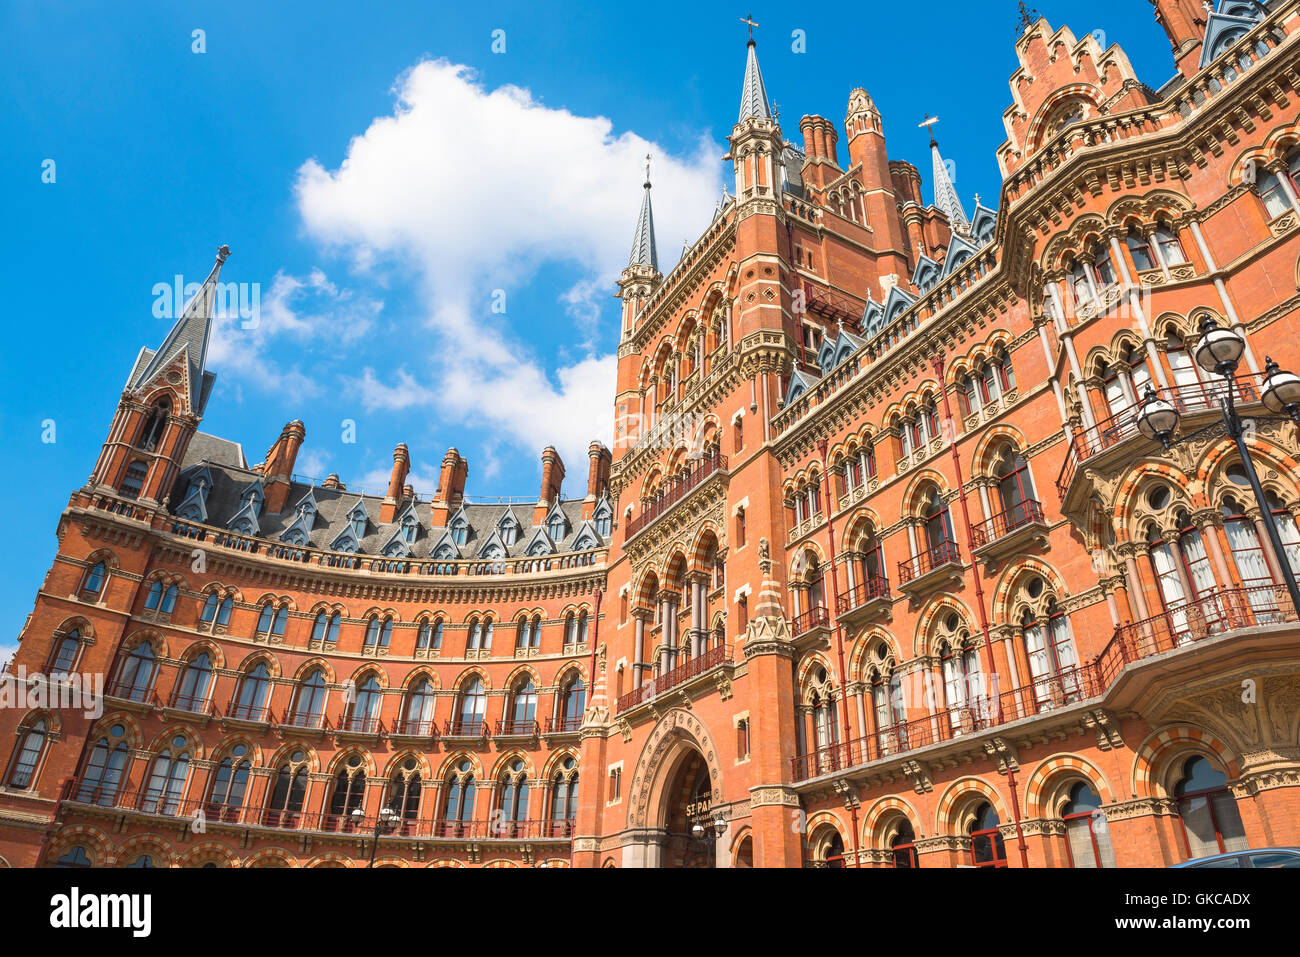 Viktorianische Architektur, London, viktorianischen neugotischen Stil St Pancras Comfort Inn Kings Cross, London, Stockbild